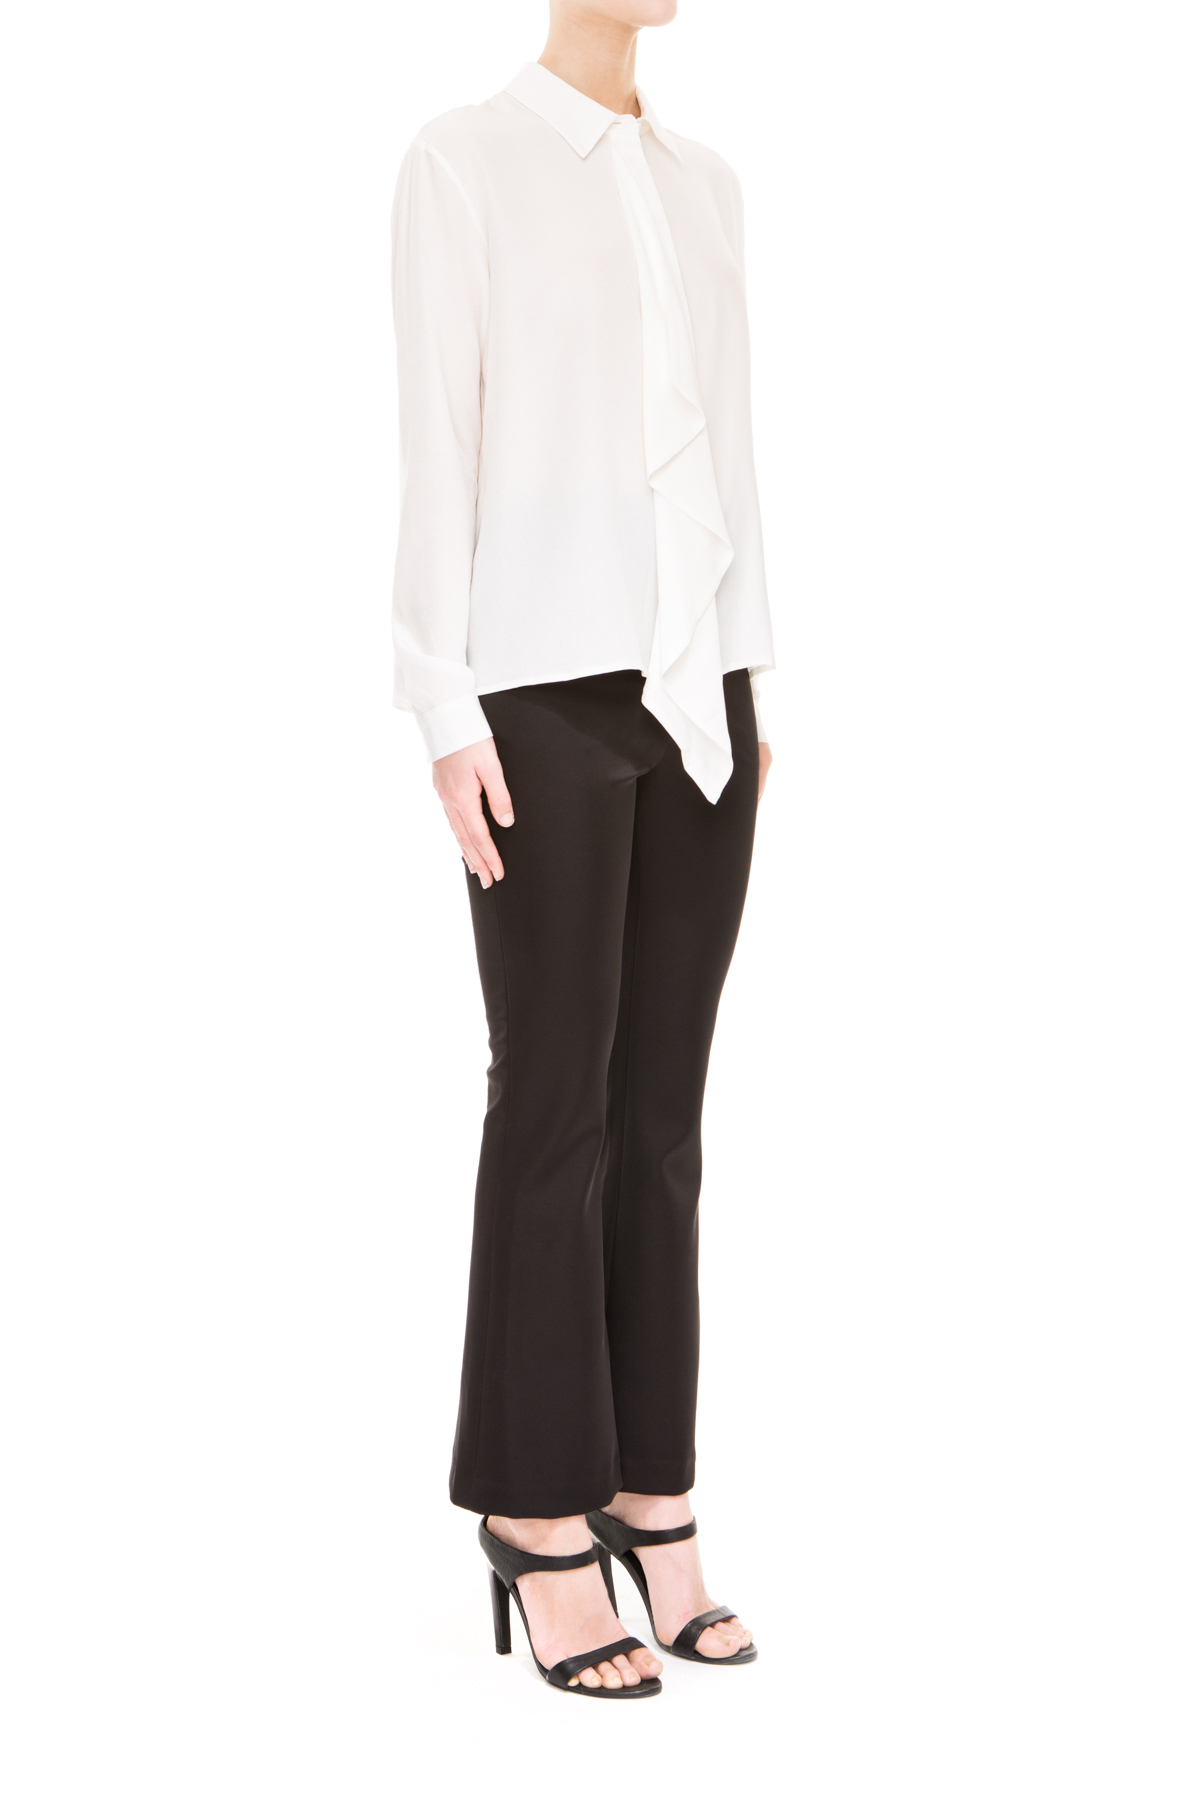 Lyst keepsake stolen heart silk long sleeve shirt in white for Silk long sleeve shirt